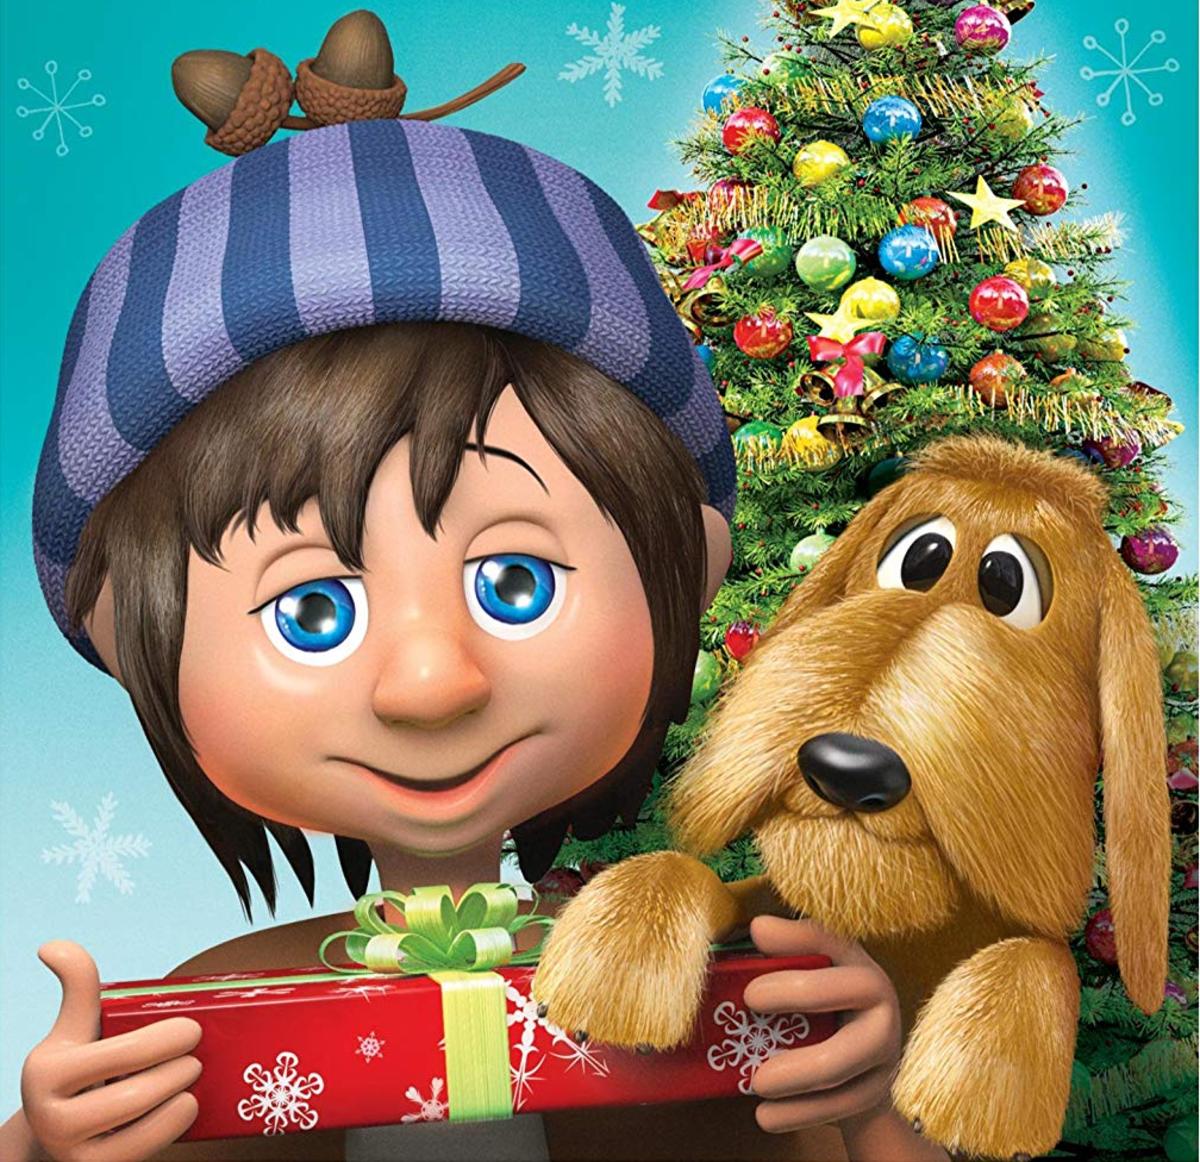 Rankin/Bass Retrospective - The First Christmas: The Story of the First Christmas Snow